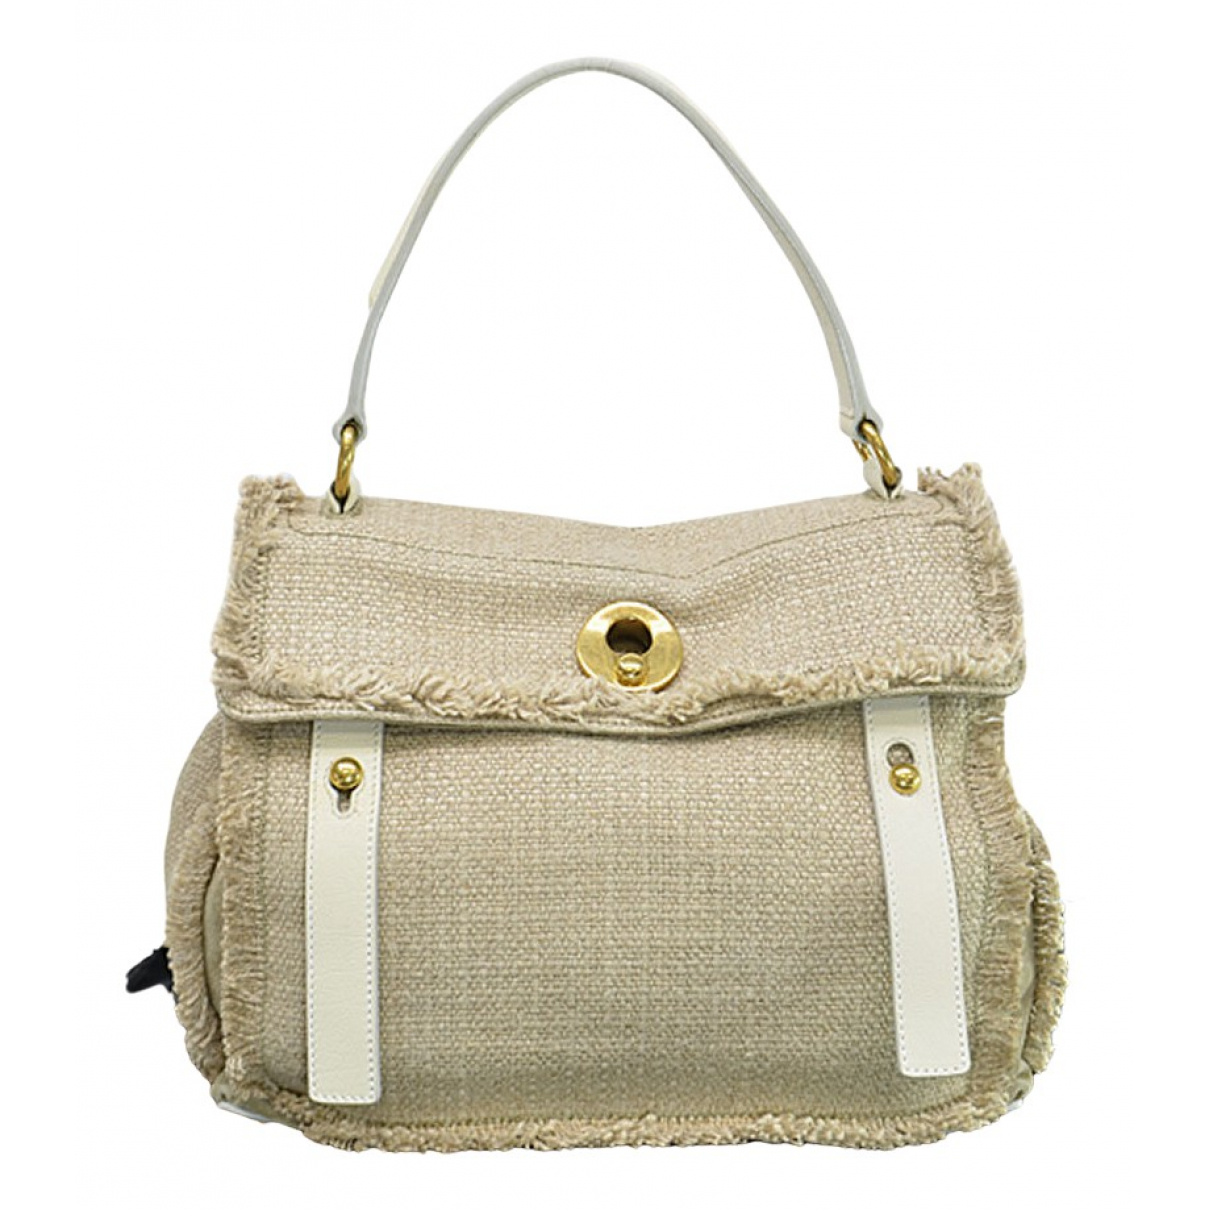 Yves Saint Laurent Muse Two Handtasche in  Beige Leinen